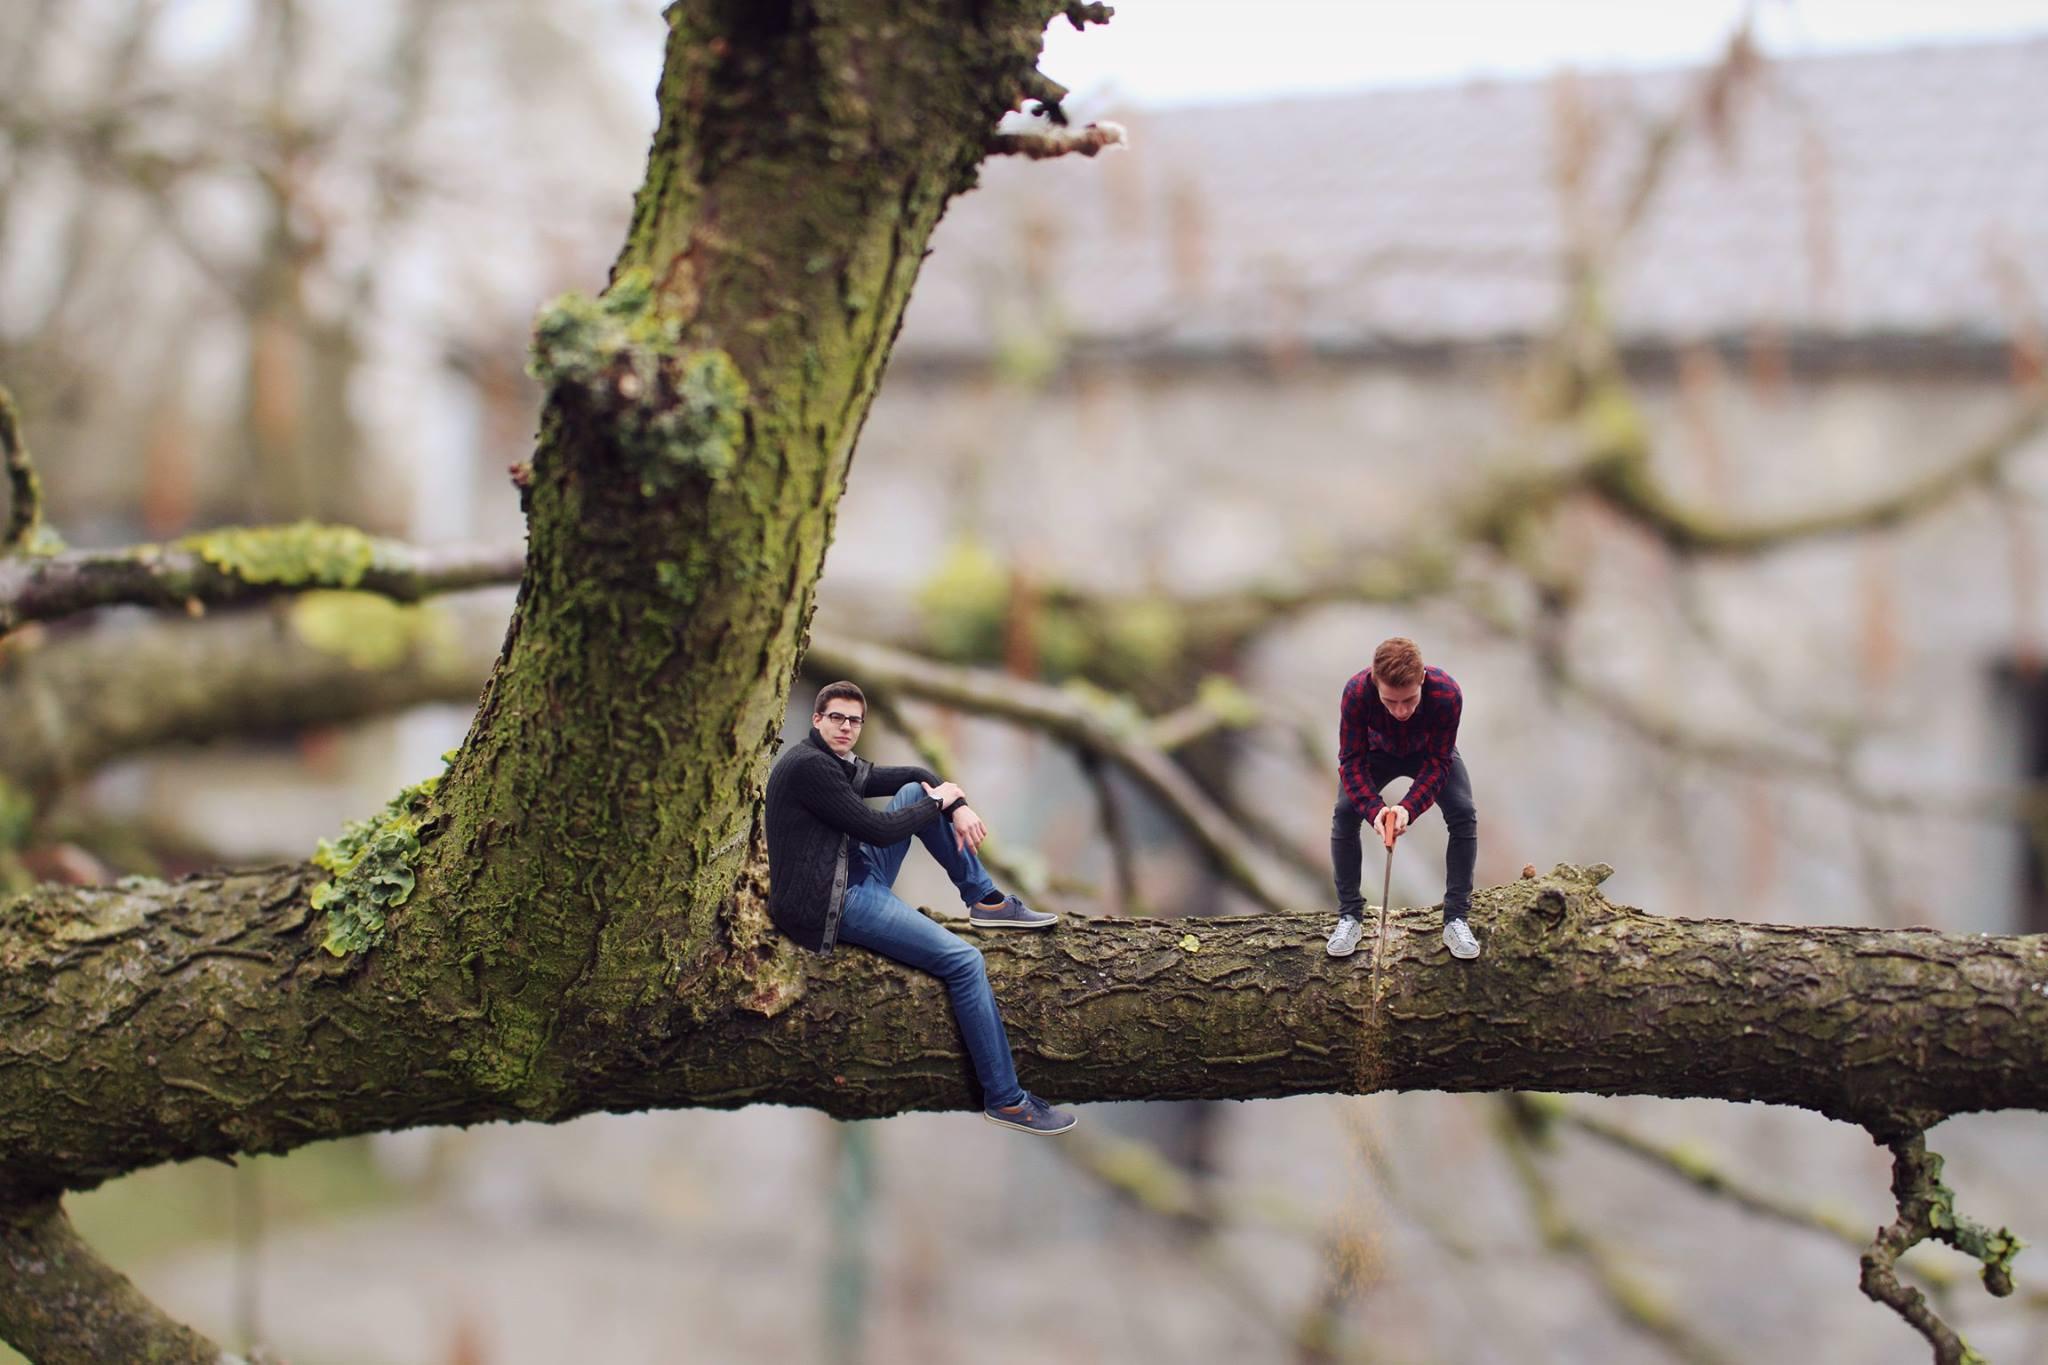 Les miniboys - scie la branche